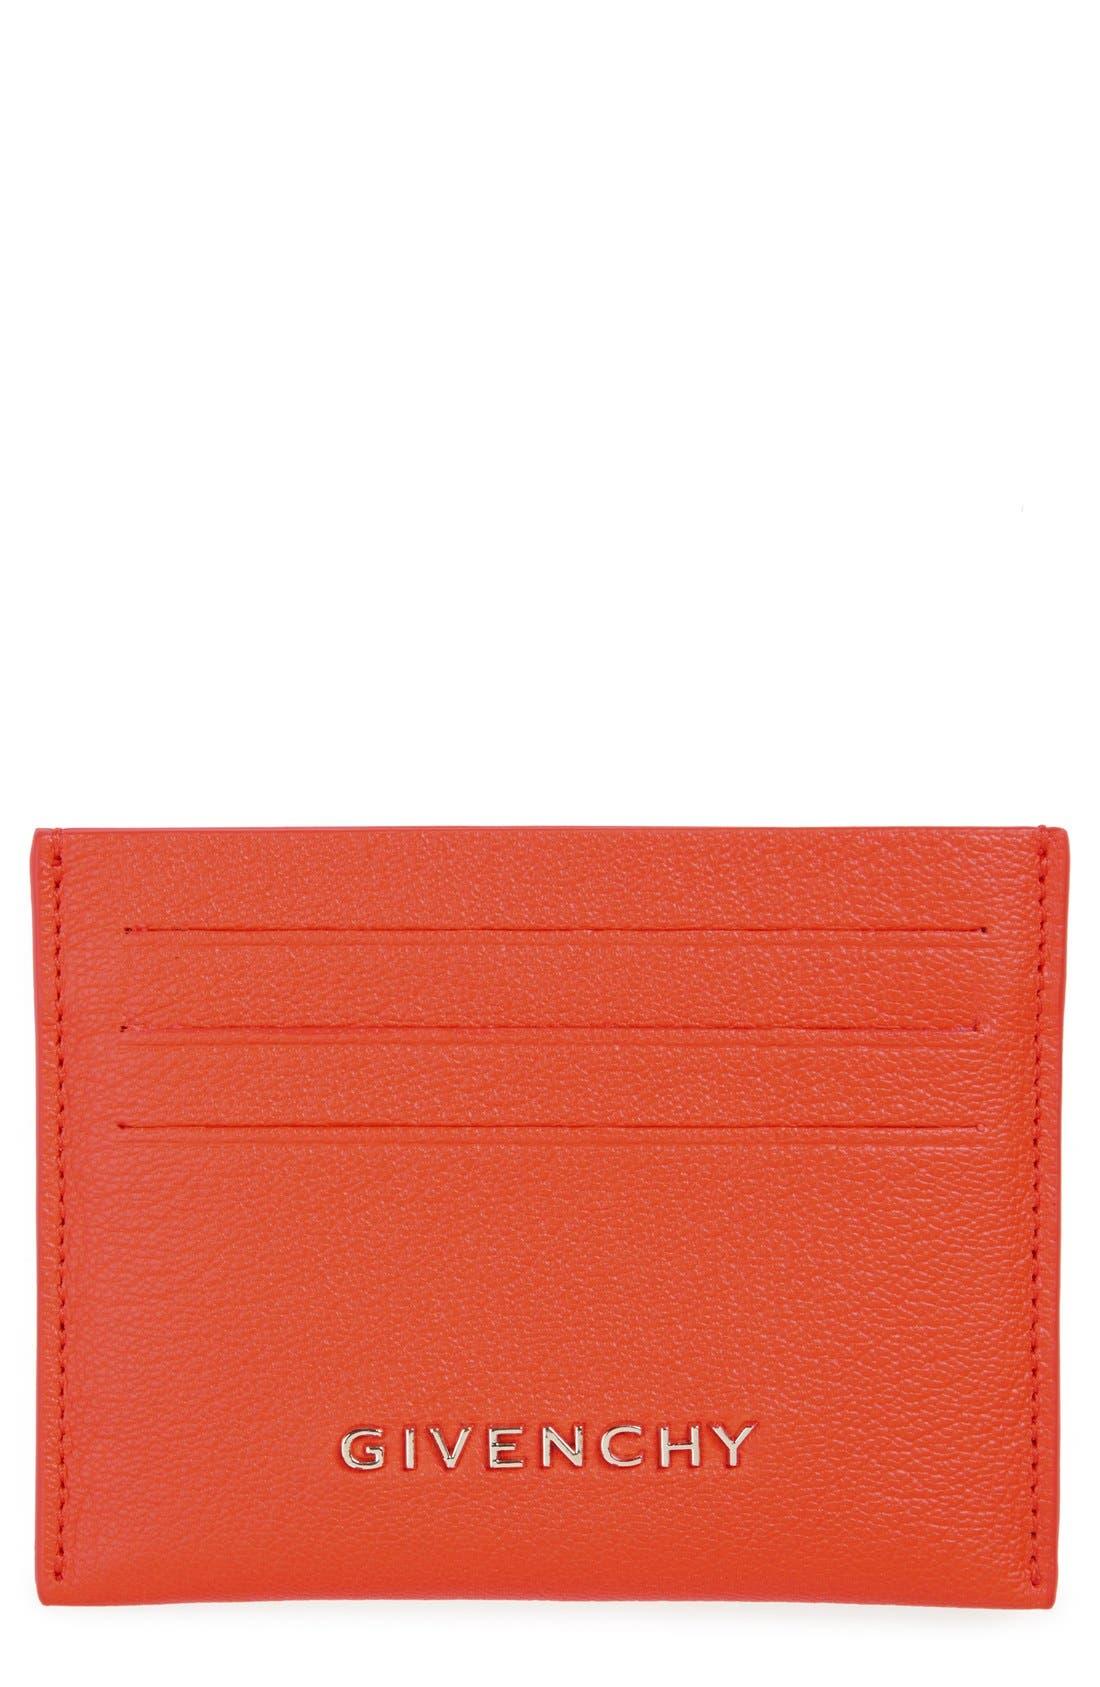 Alternate Image 1 Selected - Givenchy 'Pandora' Card Case